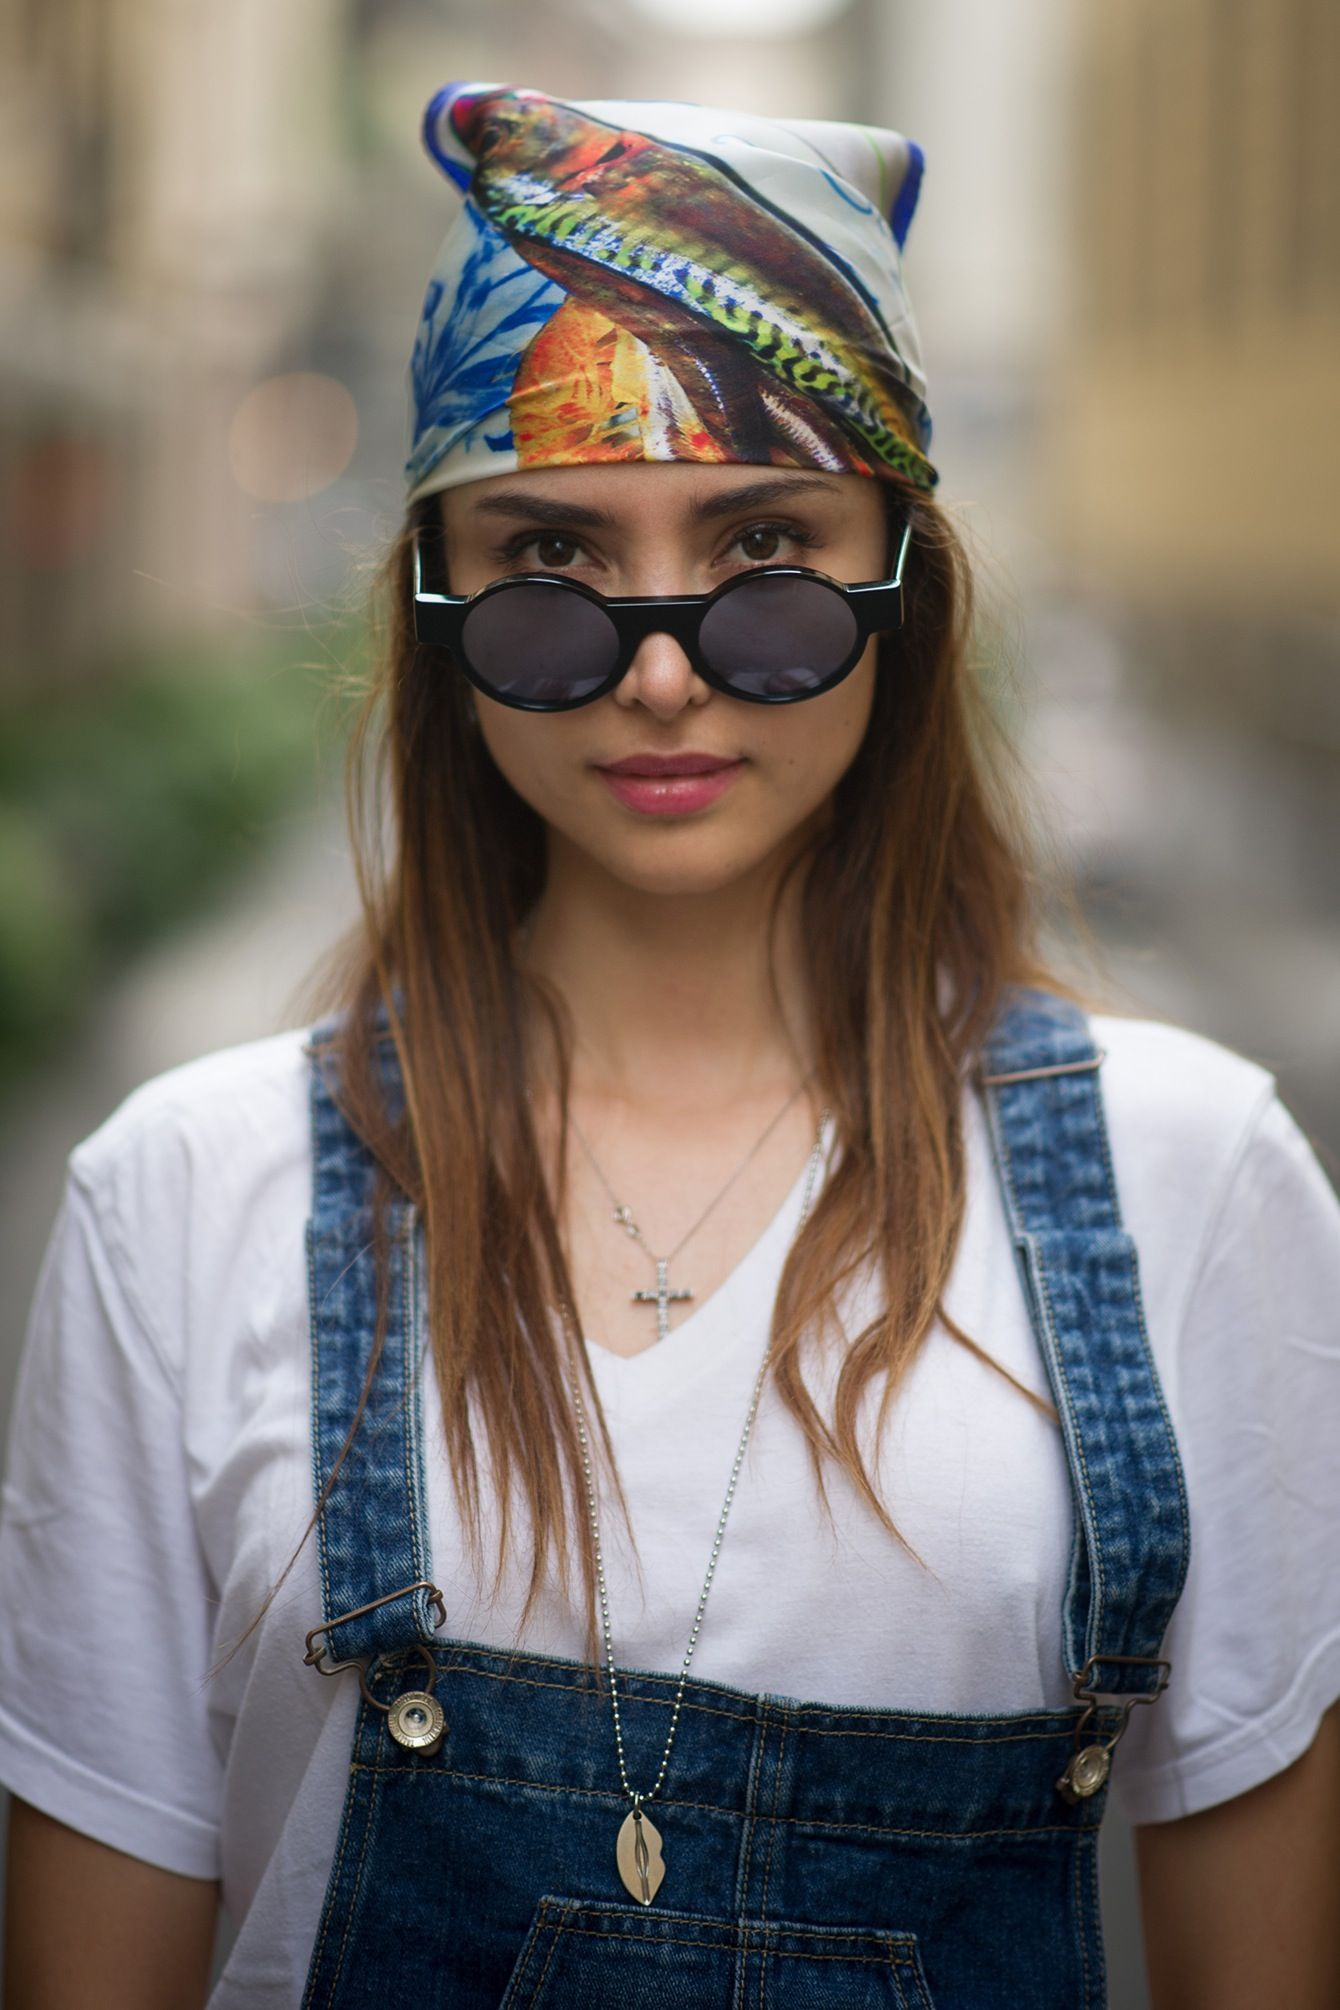 Bandana: 12 modi d'indossare il foulard